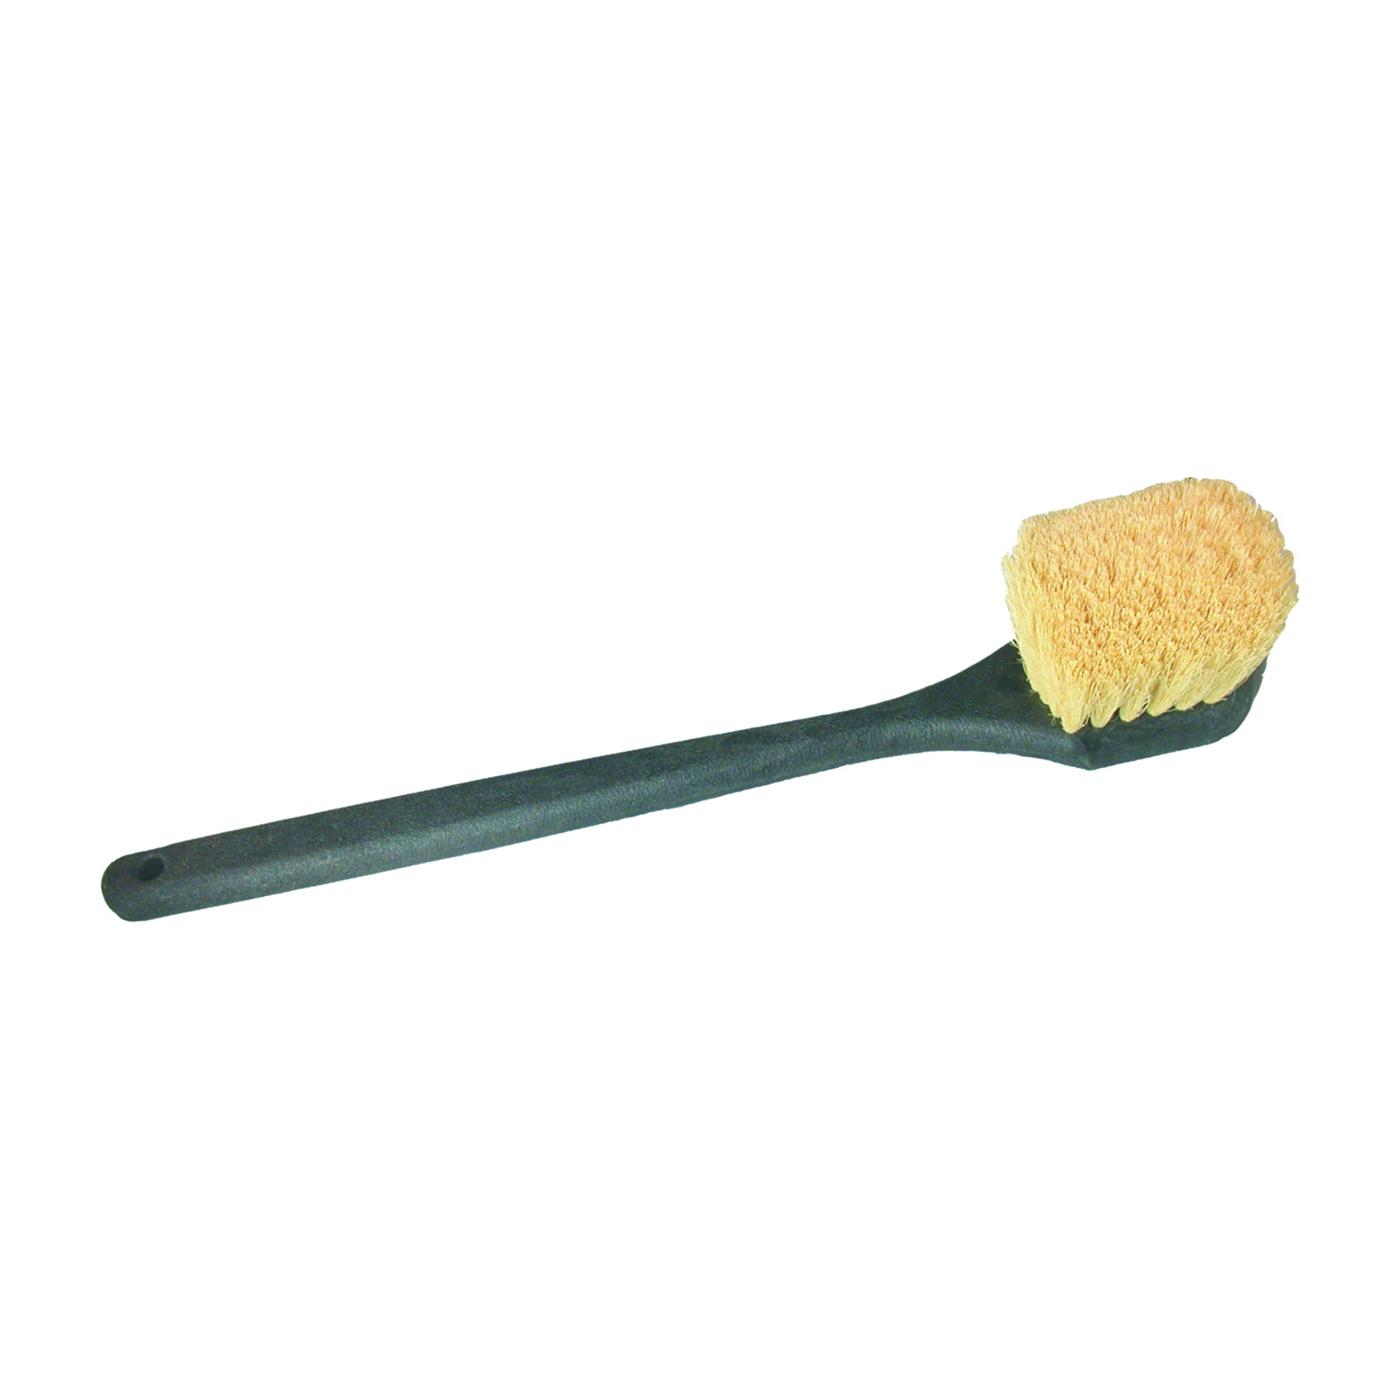 Picture of BIRDWELL 467-24 Utility Brush, 2 in L Trim